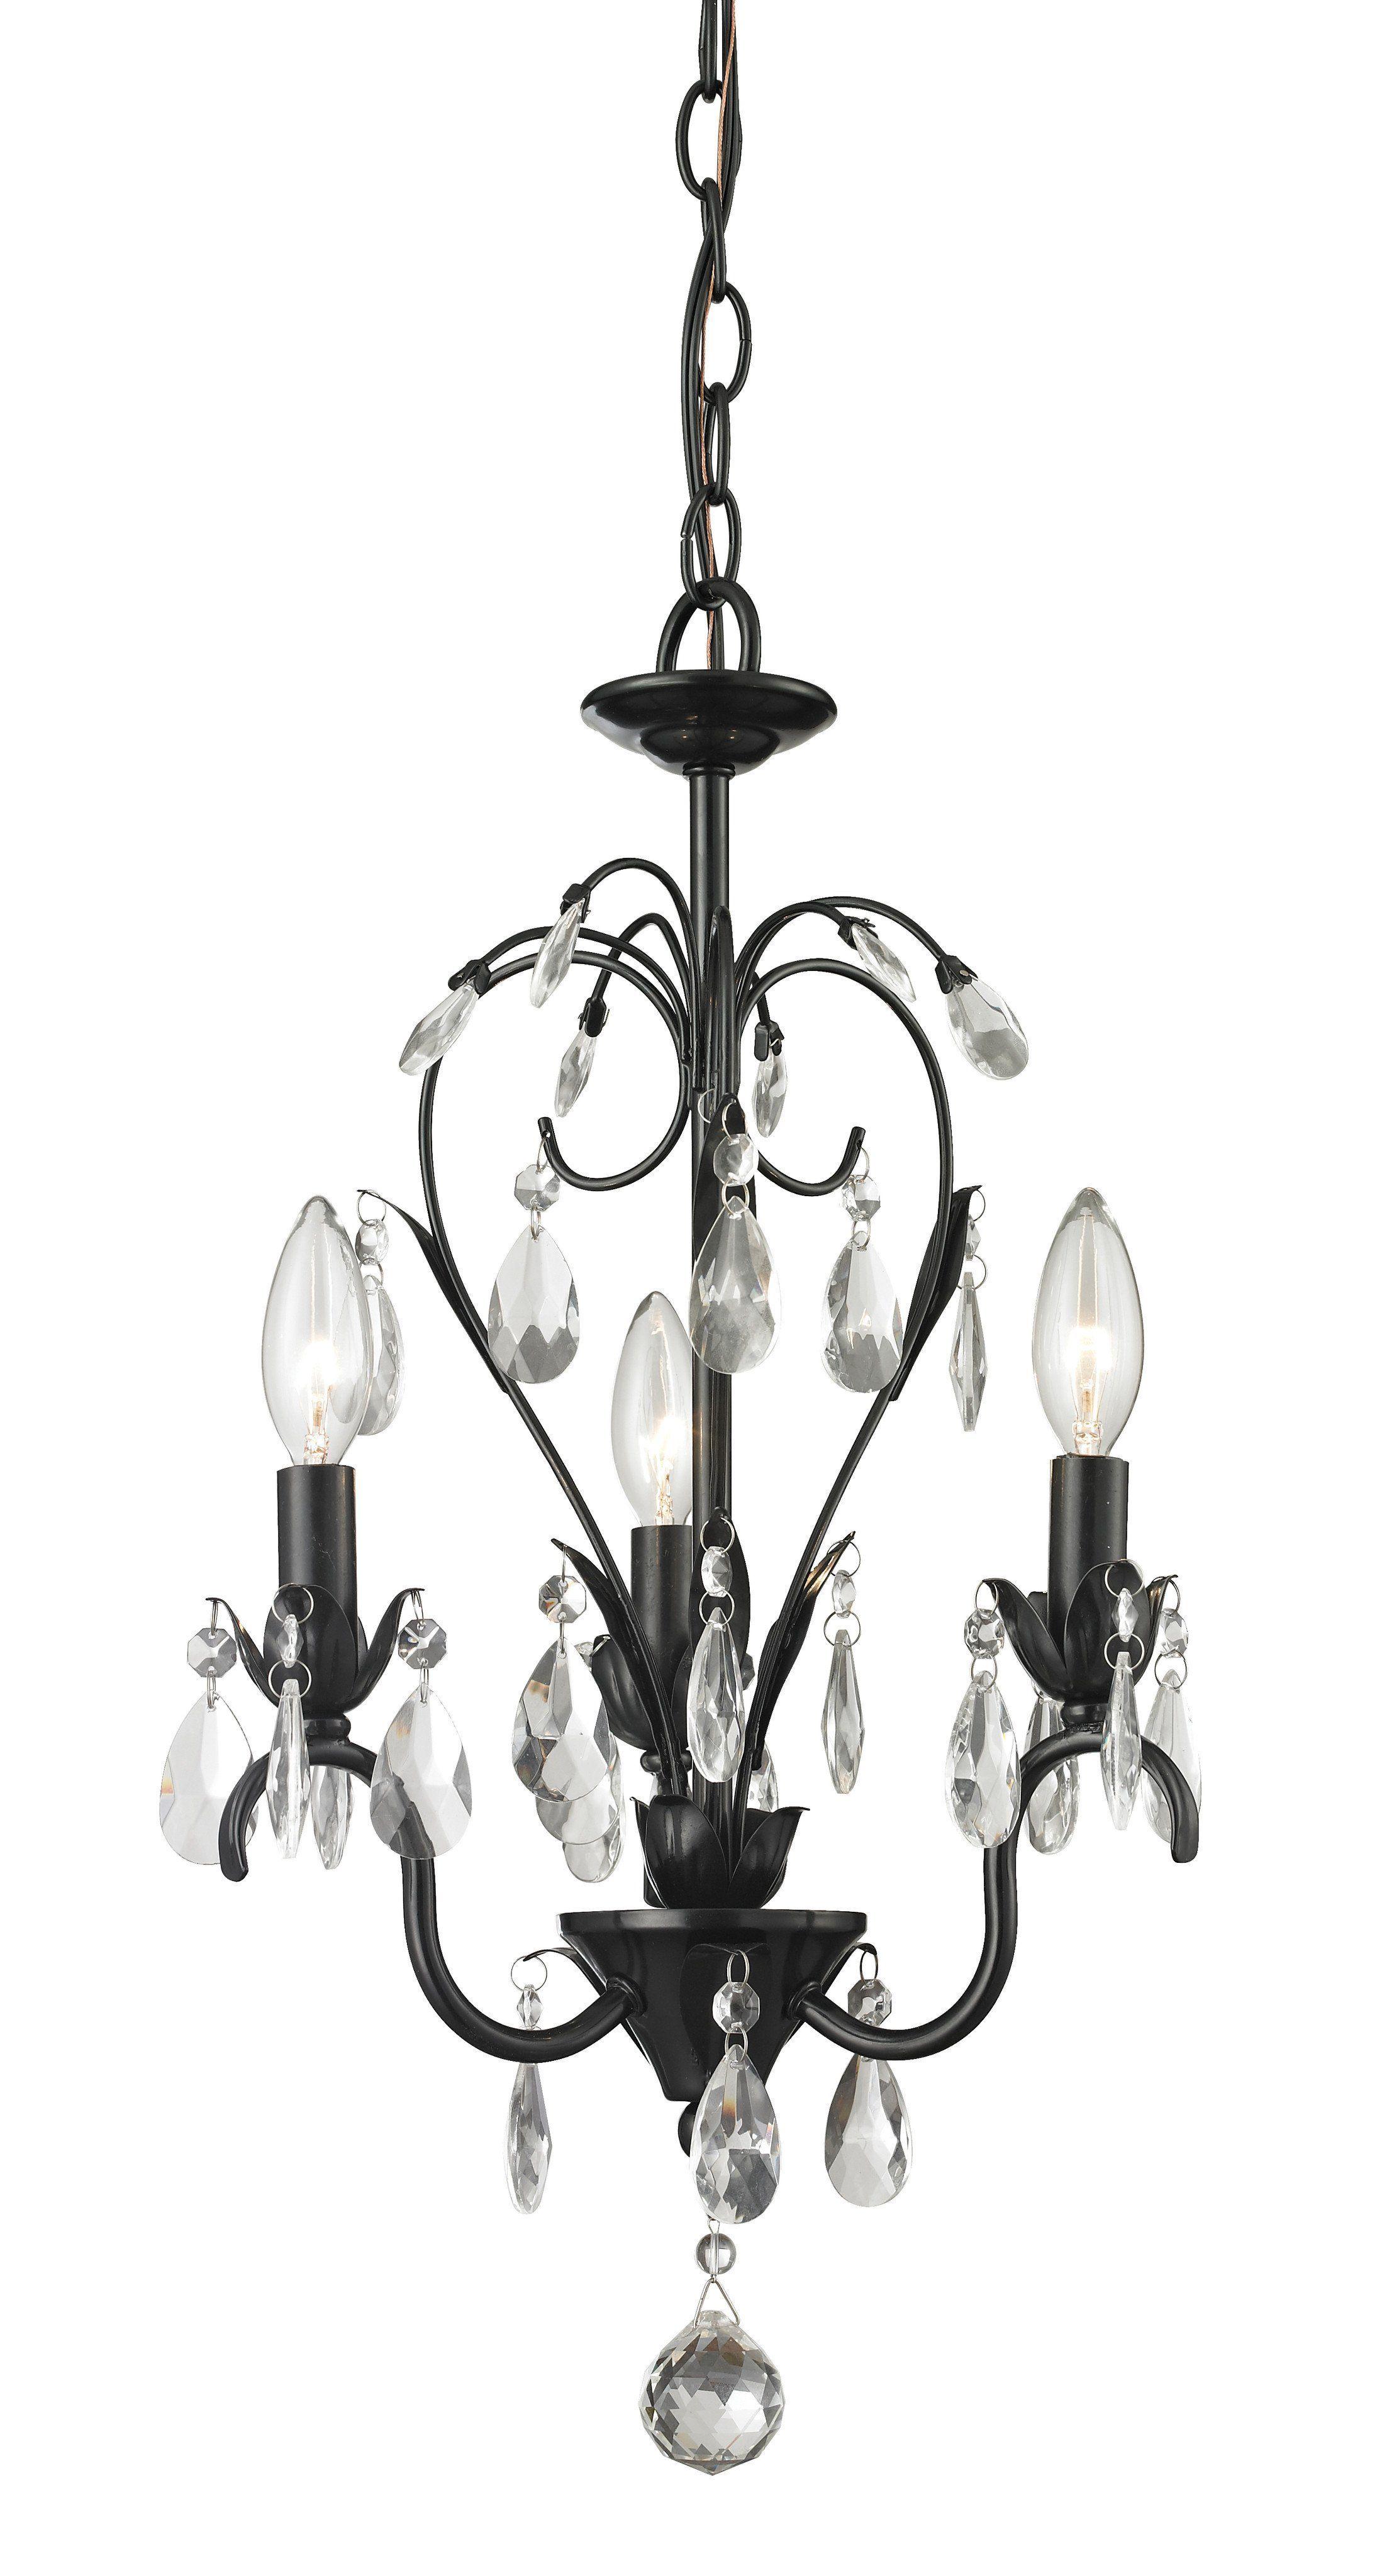 Princess chandeliers gloss black steel light mini chandelier h